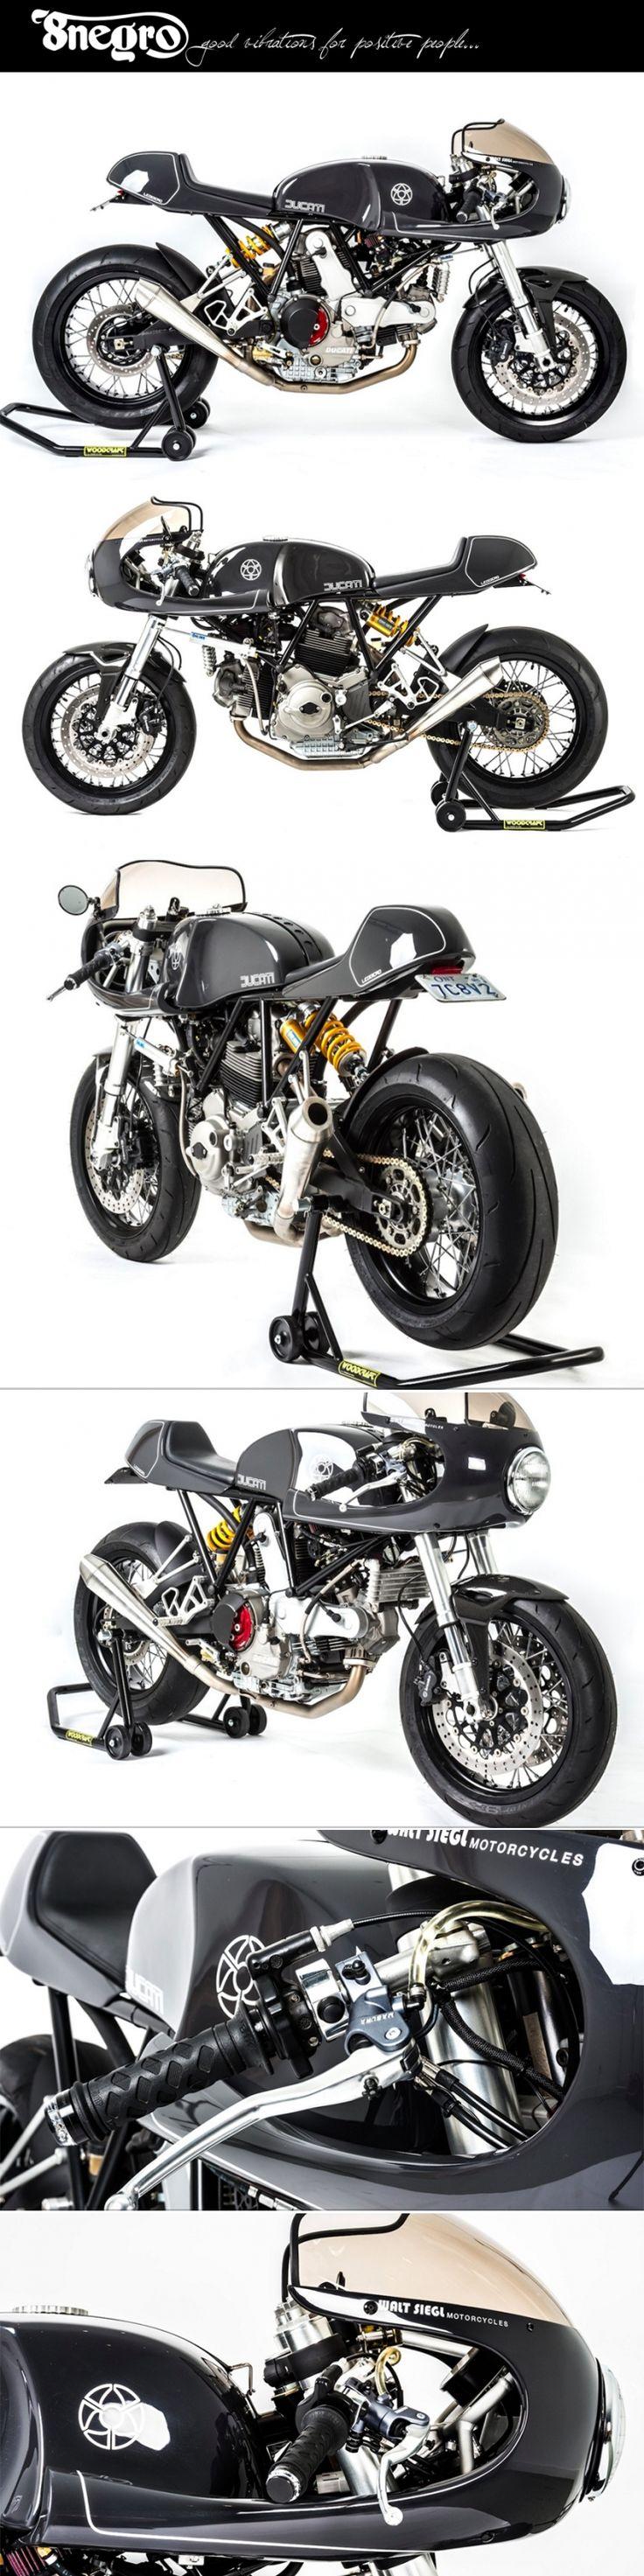 Ducati Leggero:: Walt Siegl Motorcycles.  8negro